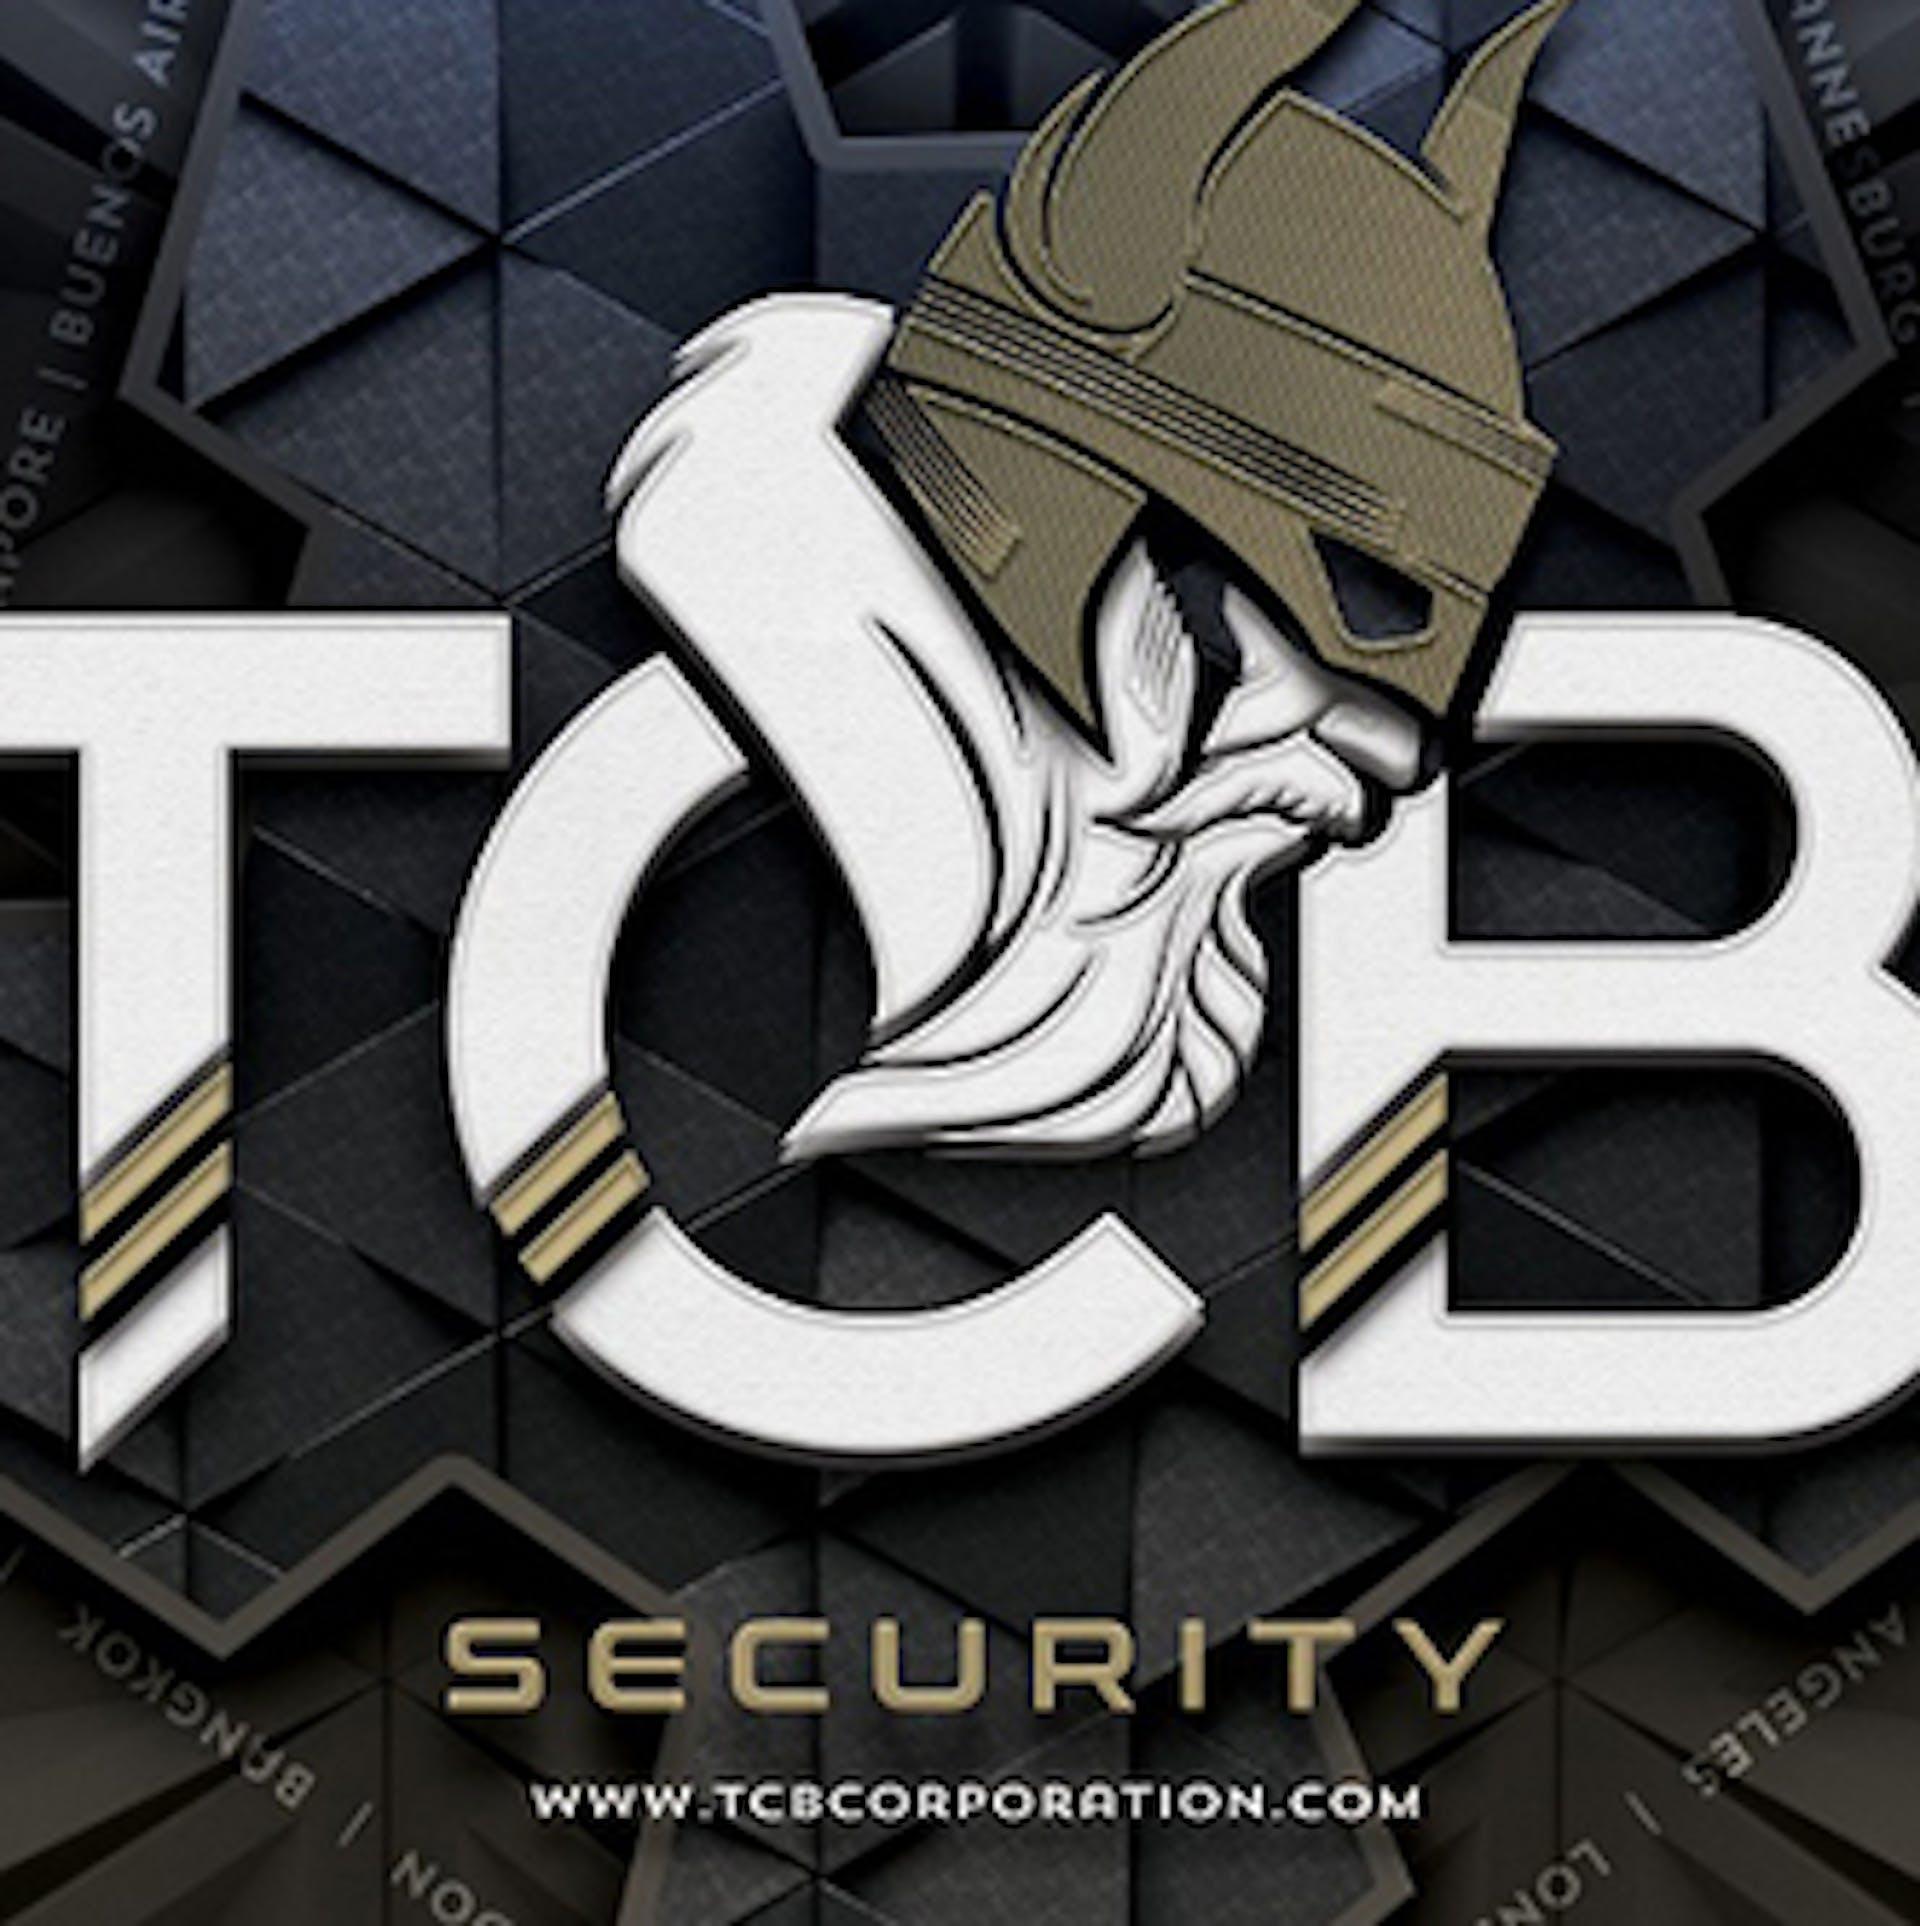 TCB refresh